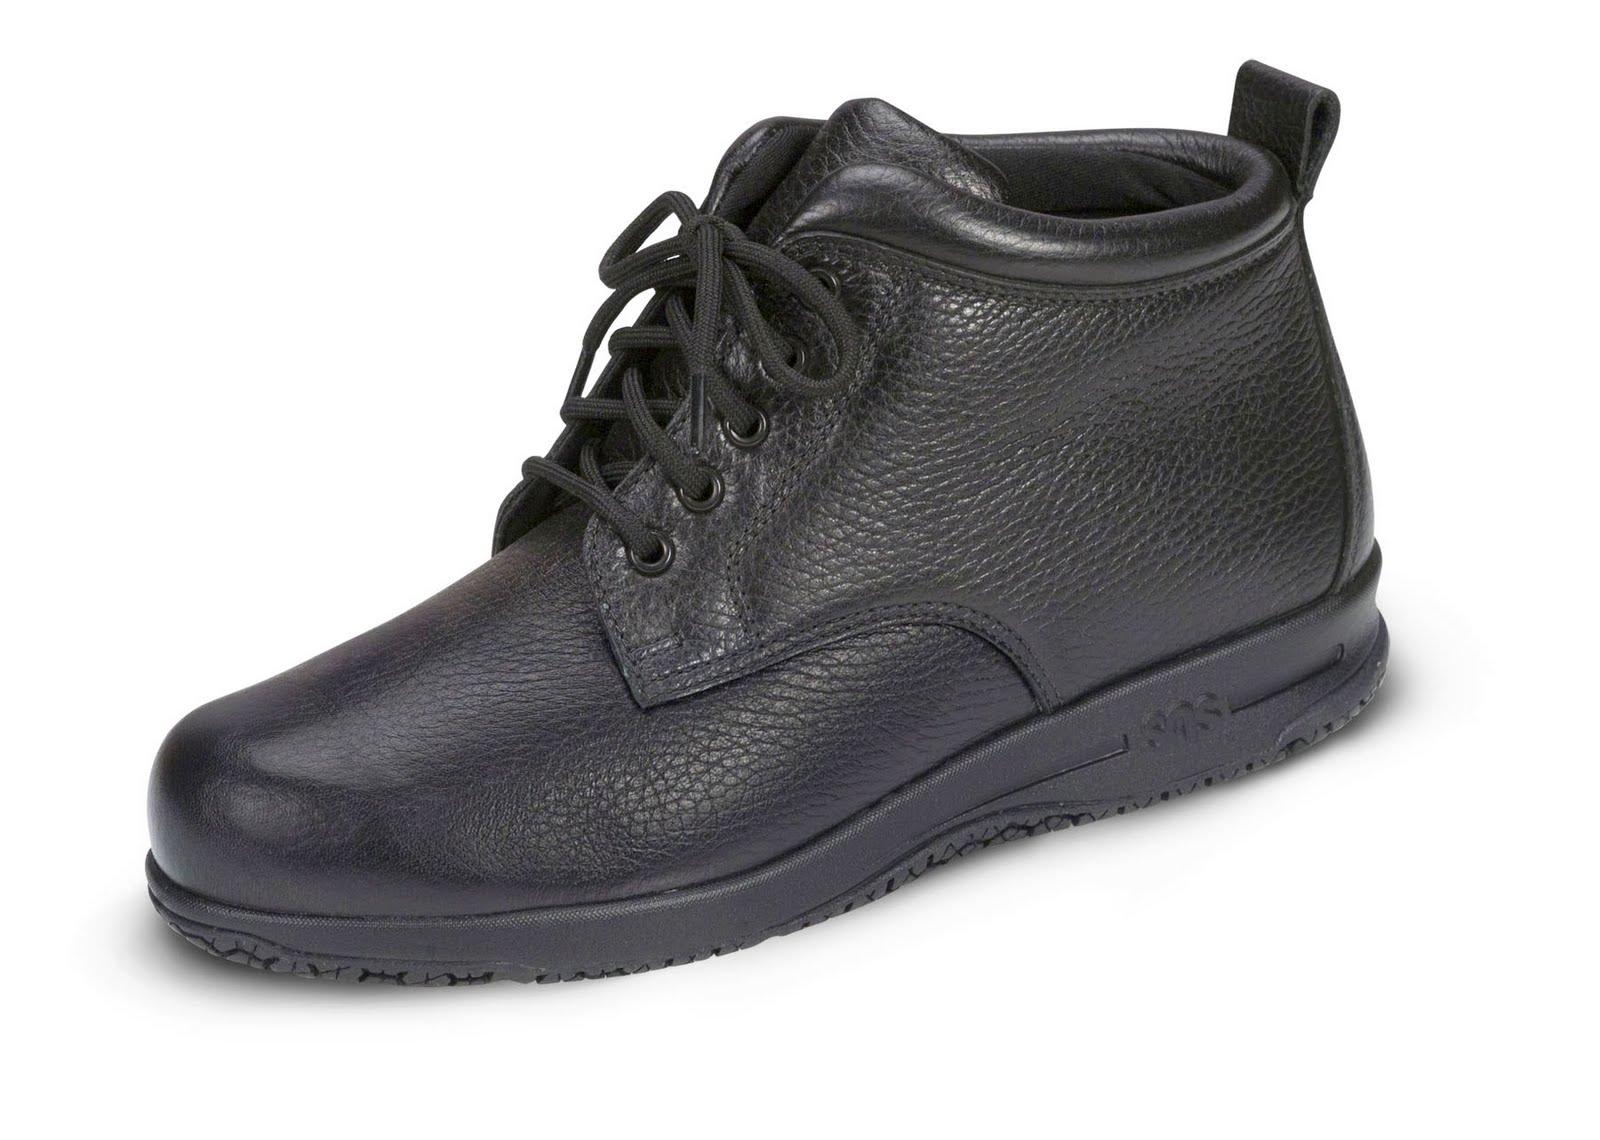 ensor s comfort shoes betty s alpine slip